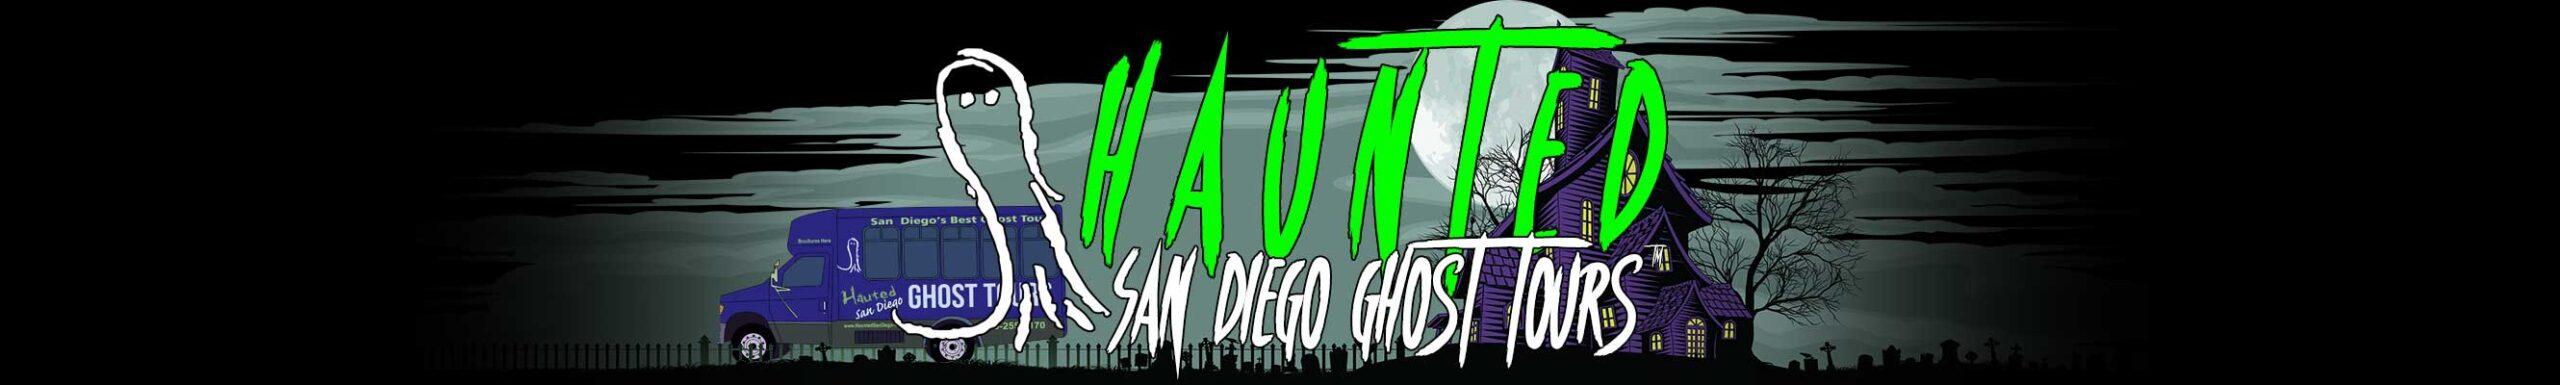 haunted-san-diego-ghost-tour-hero-logo